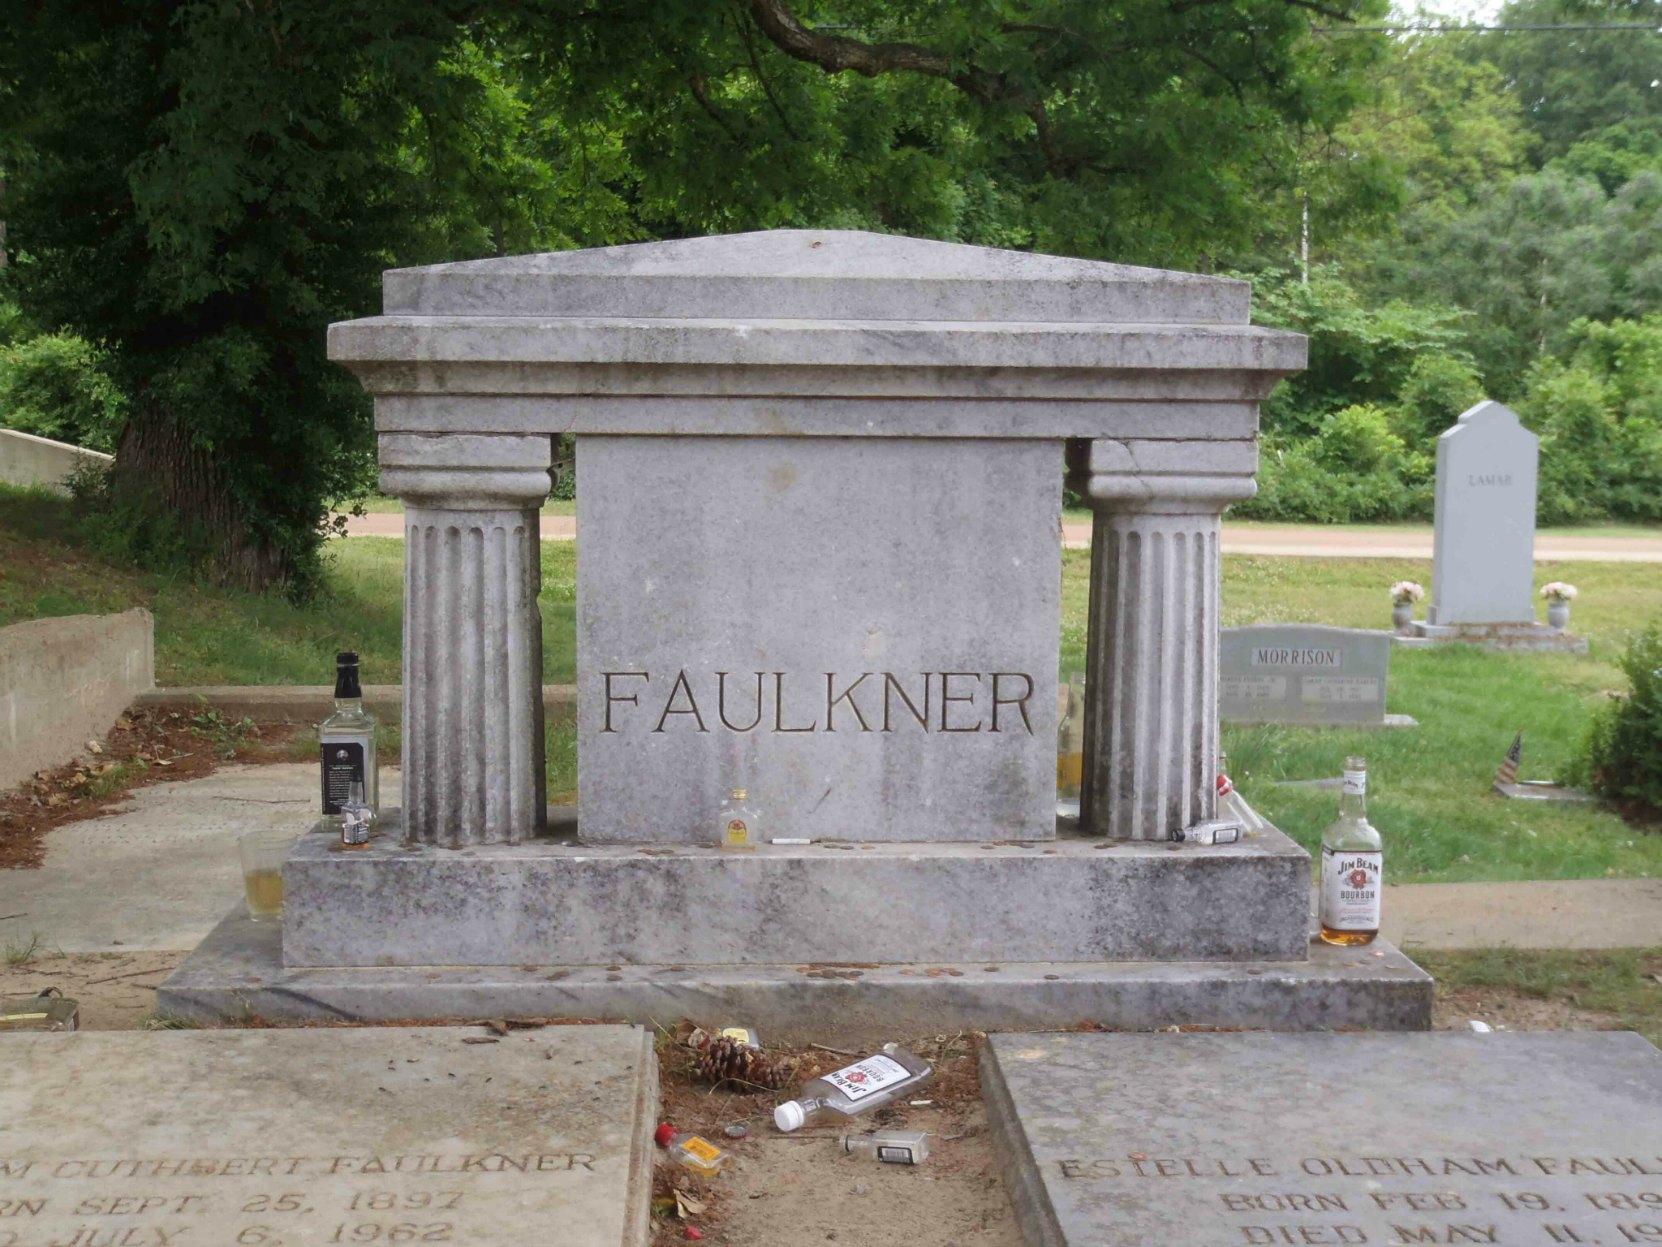 William Faulkner's grave in Oxford, Mississippi. The liquor bottles are tributes left at the grave by William Faulkner's fans.